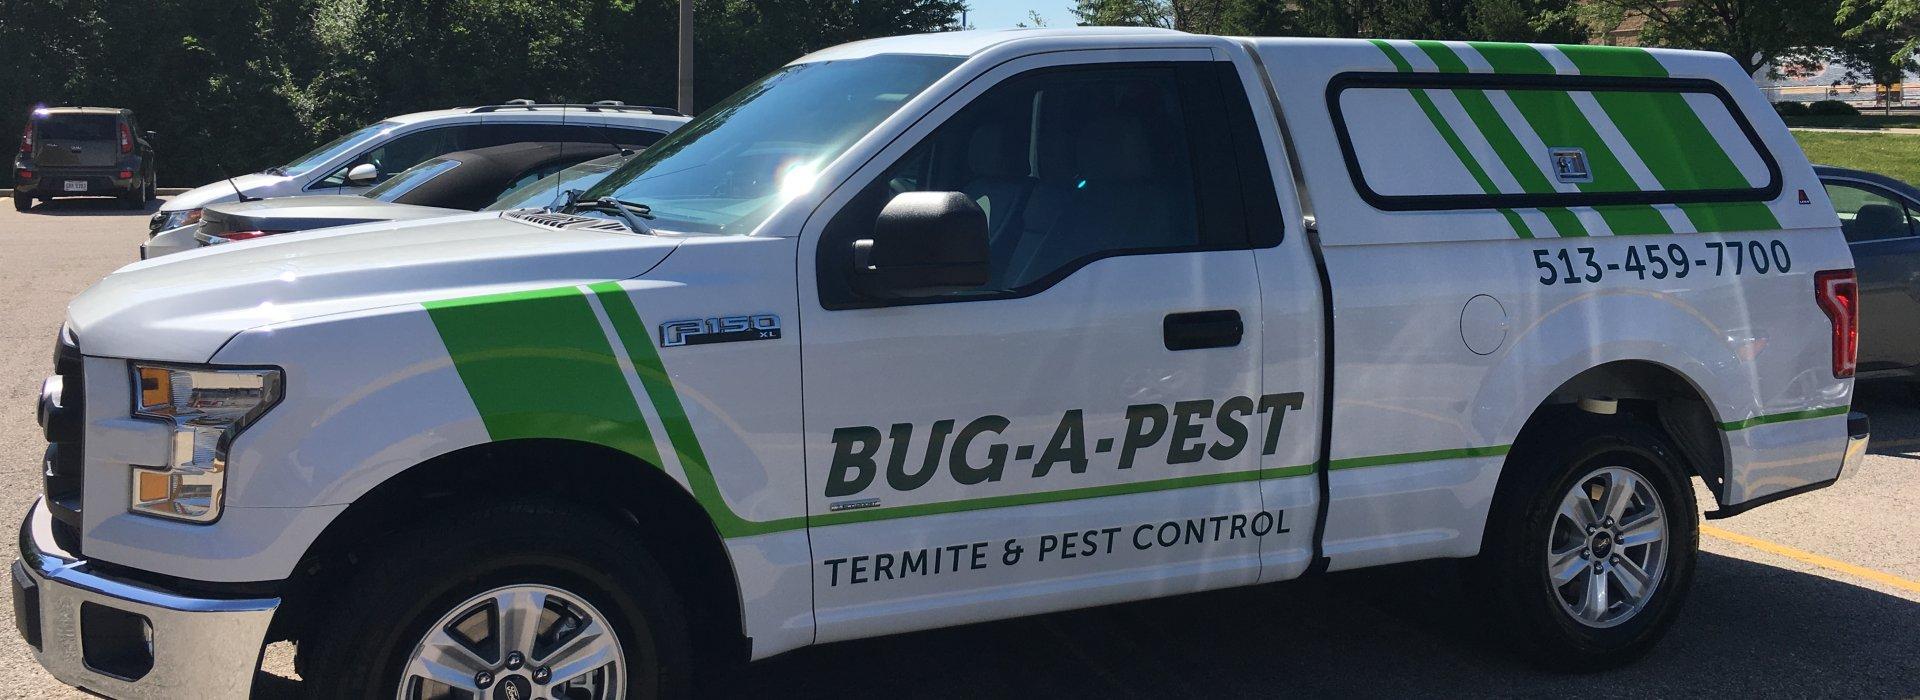 bugapest vehicle graphics